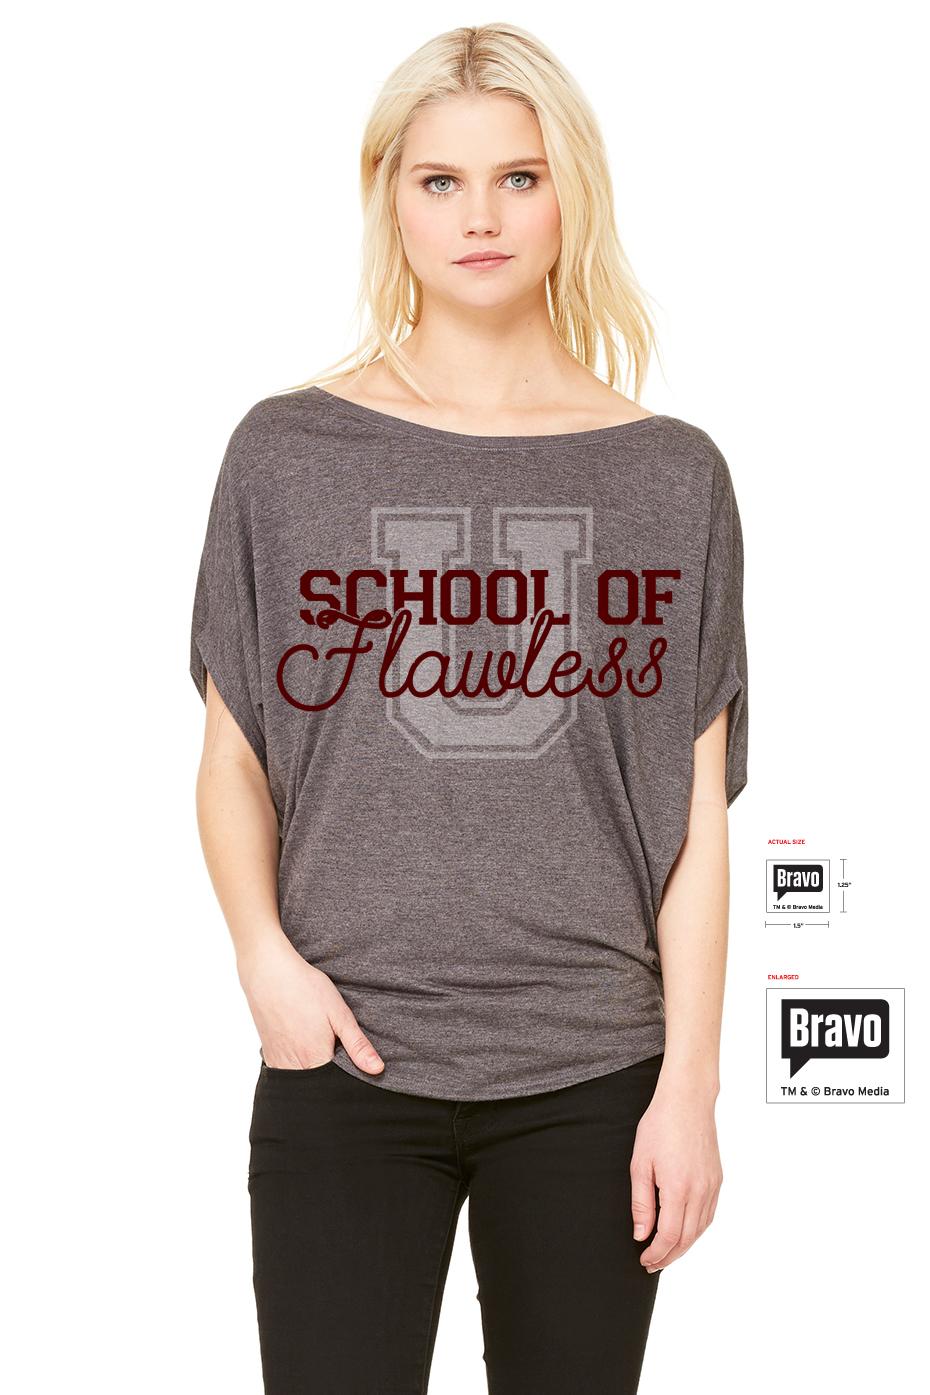 SCHOOL_OF_FLAWLESS.jpg